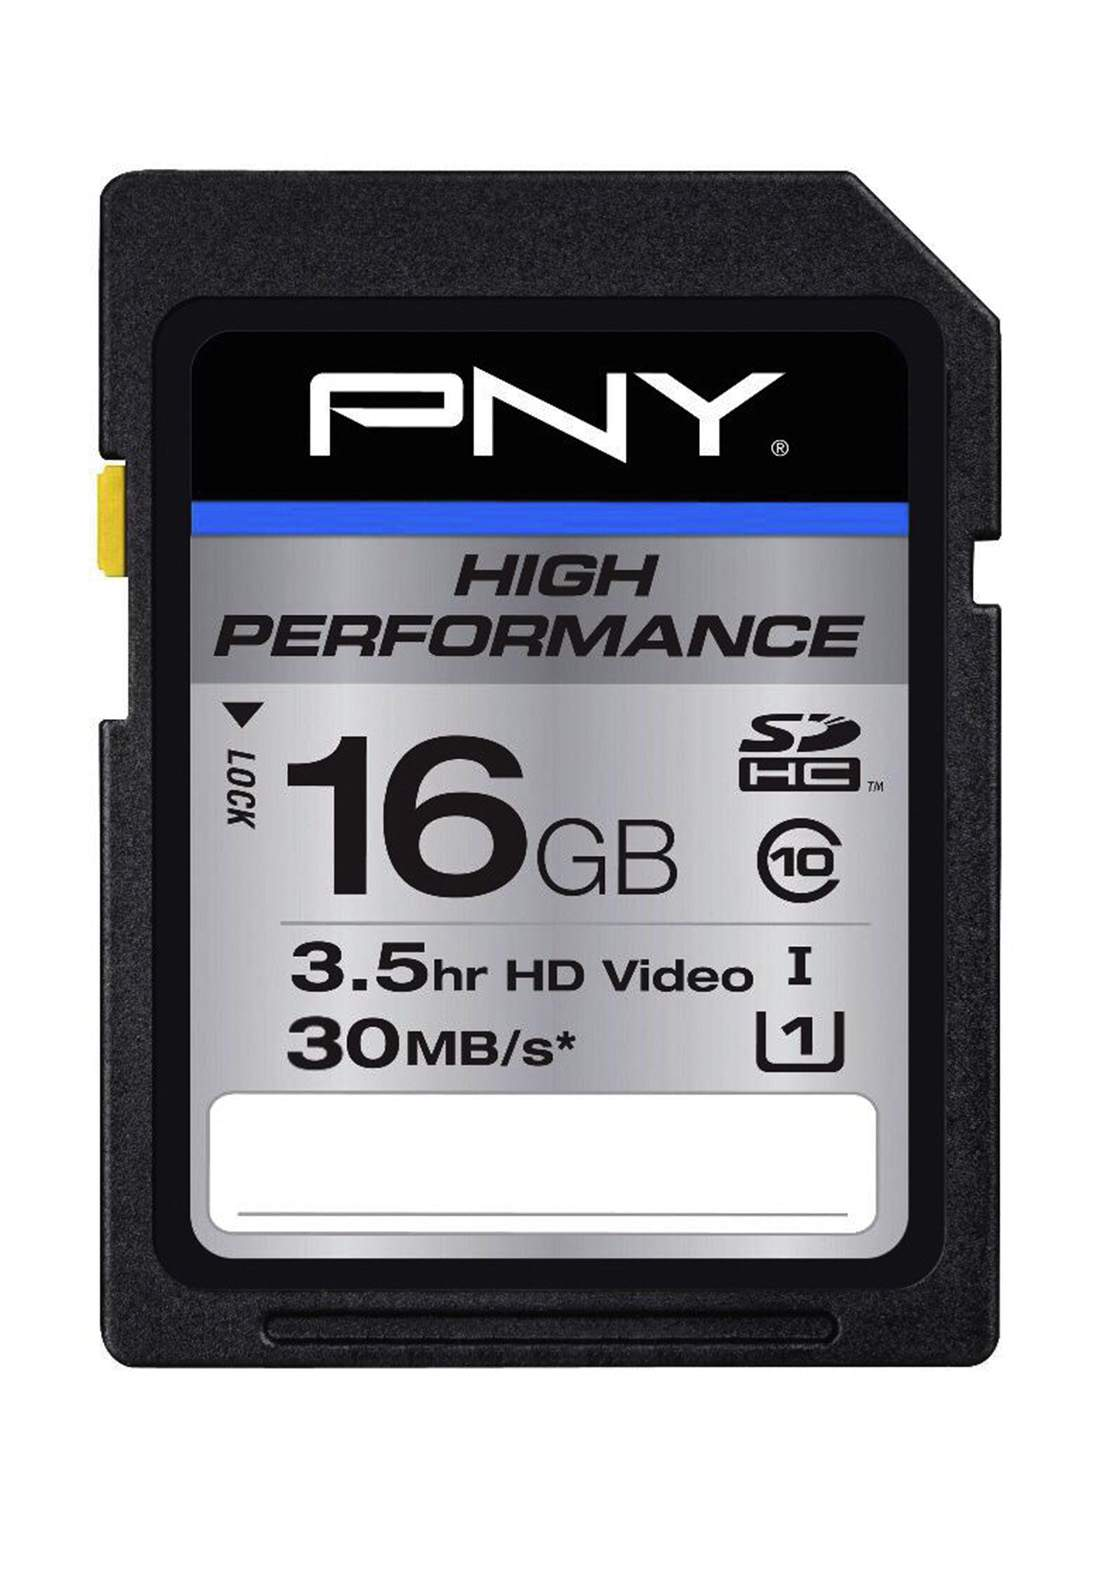 PNY High Performance 16GB SDHC memory card بطاقة ذاكرة